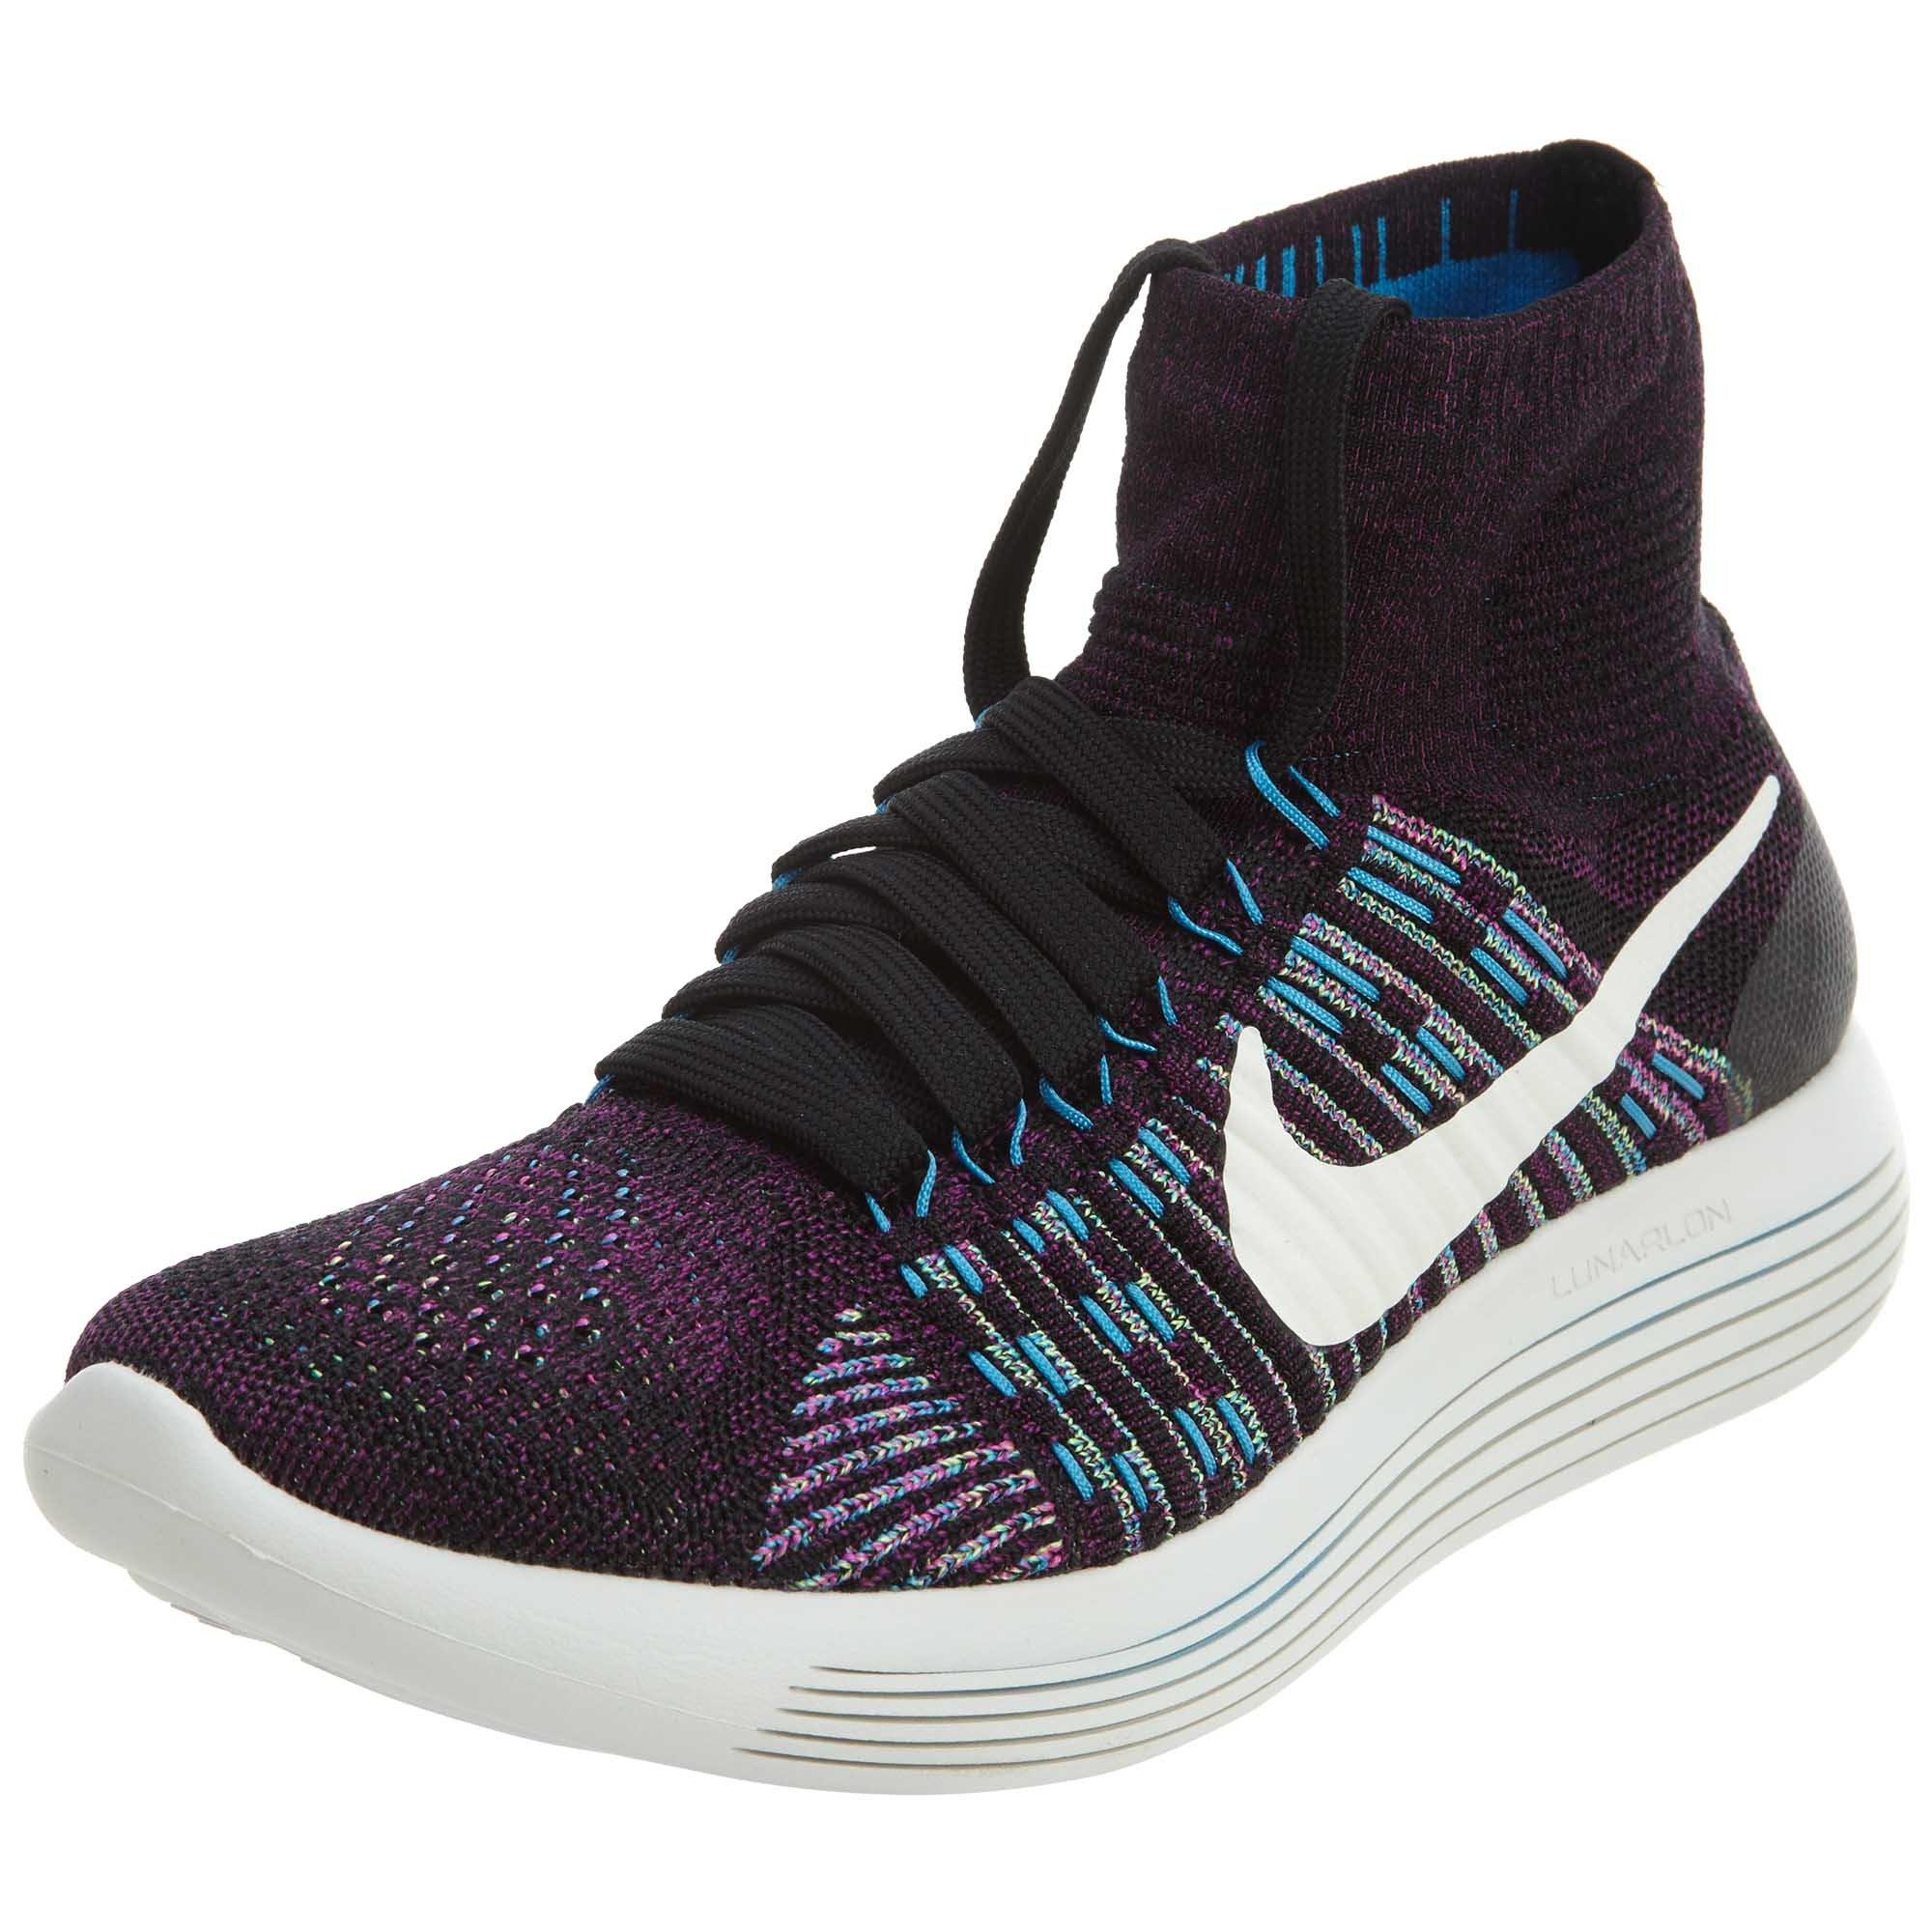 Nike Lunarepic Flyknit Womens Style : 818677-008 Size : 6.5 M US